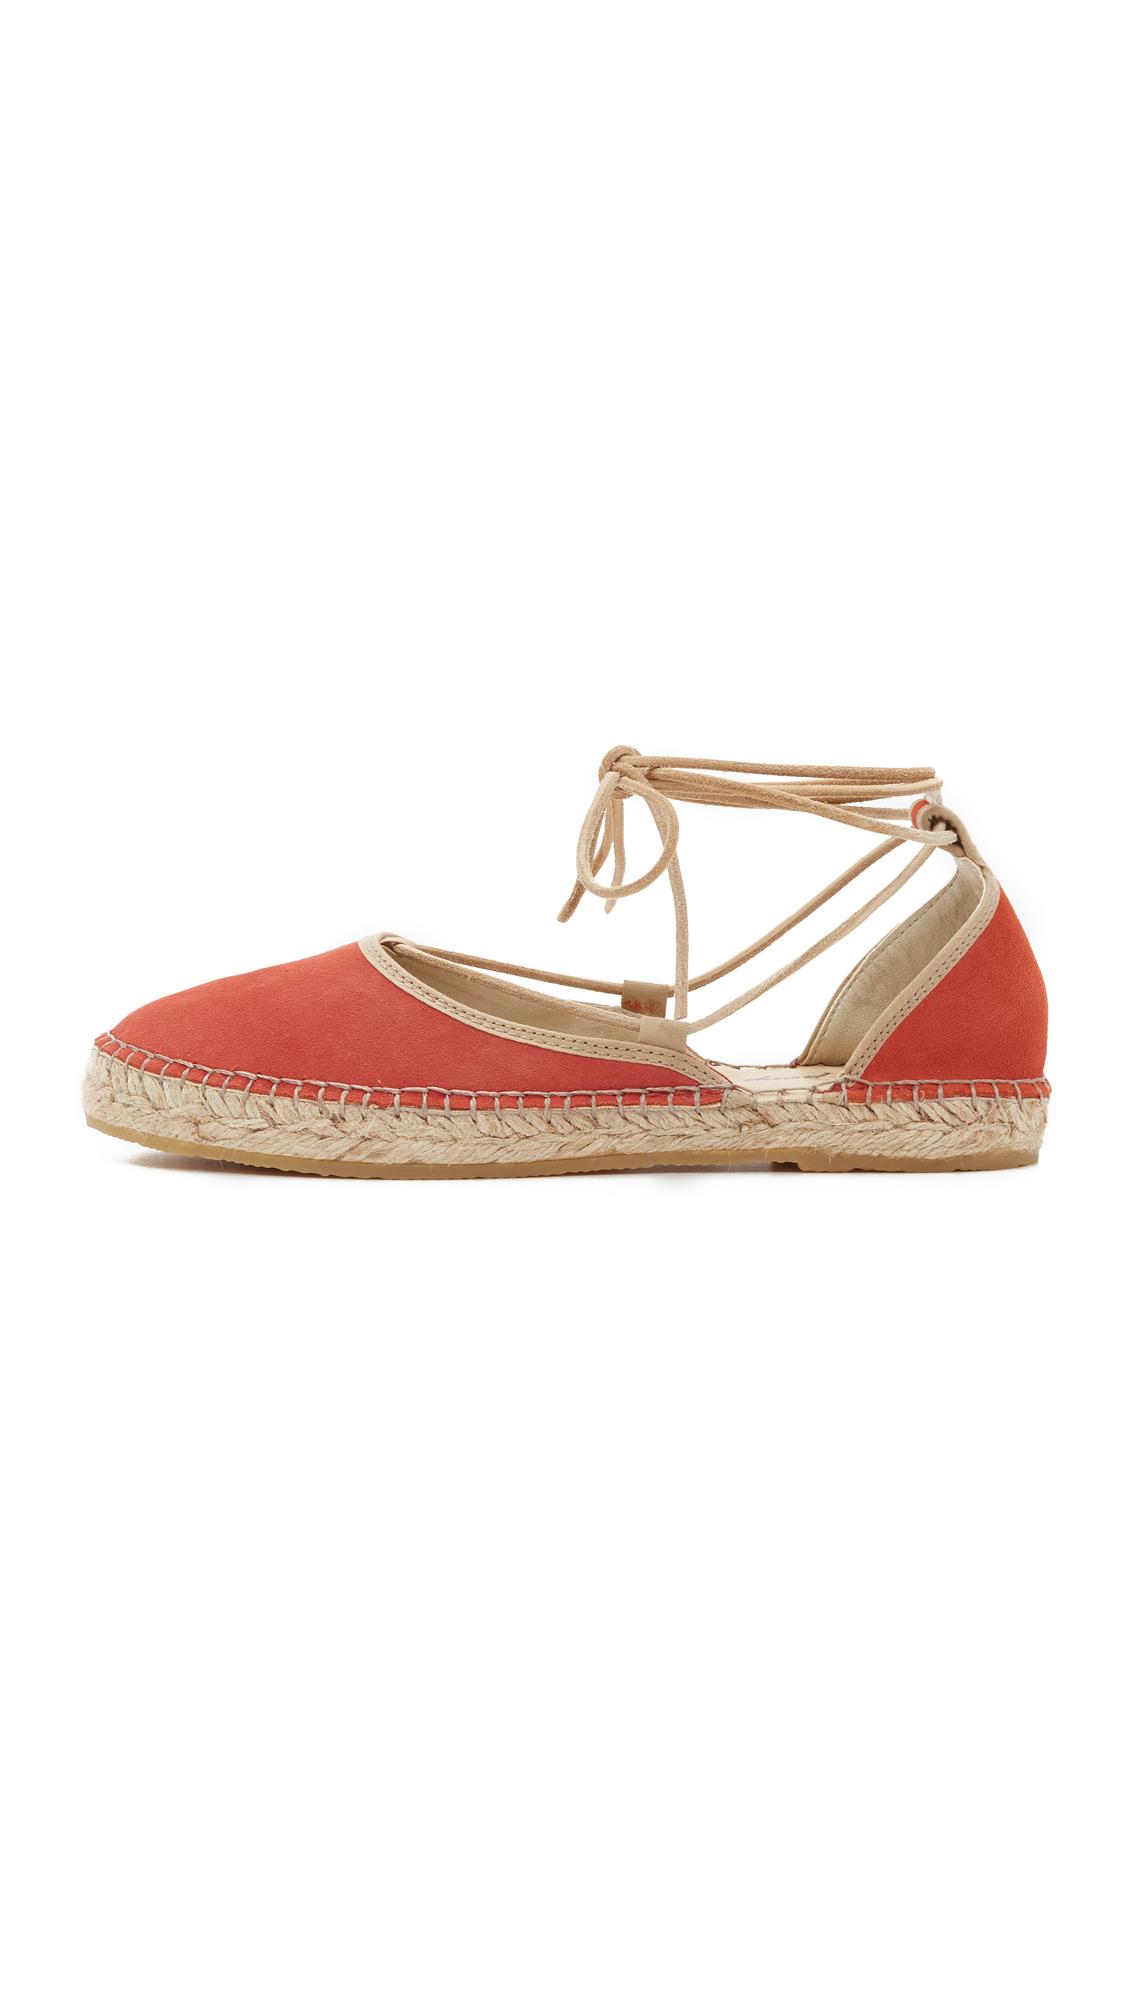 Normal Size Bow Shoe Laces